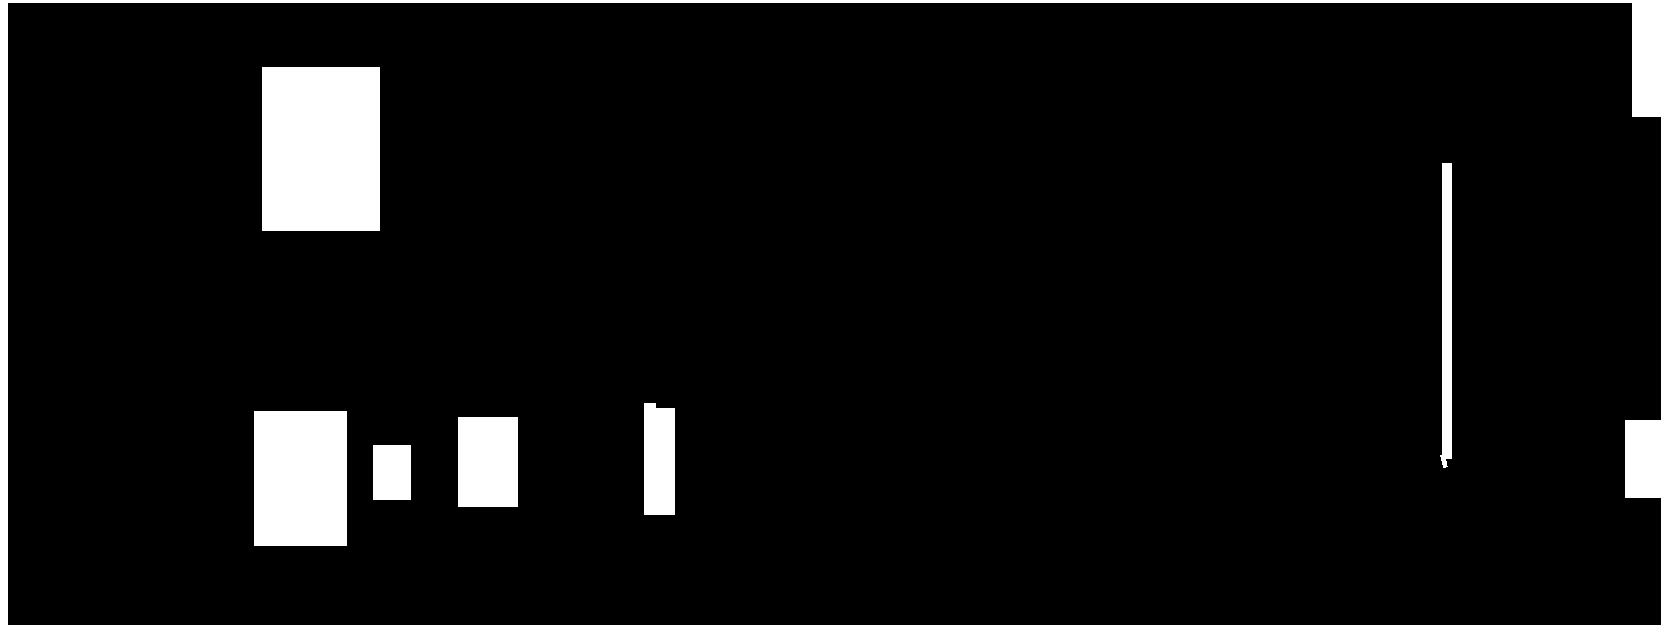 Line Drawing of the Tiller — 17' SC